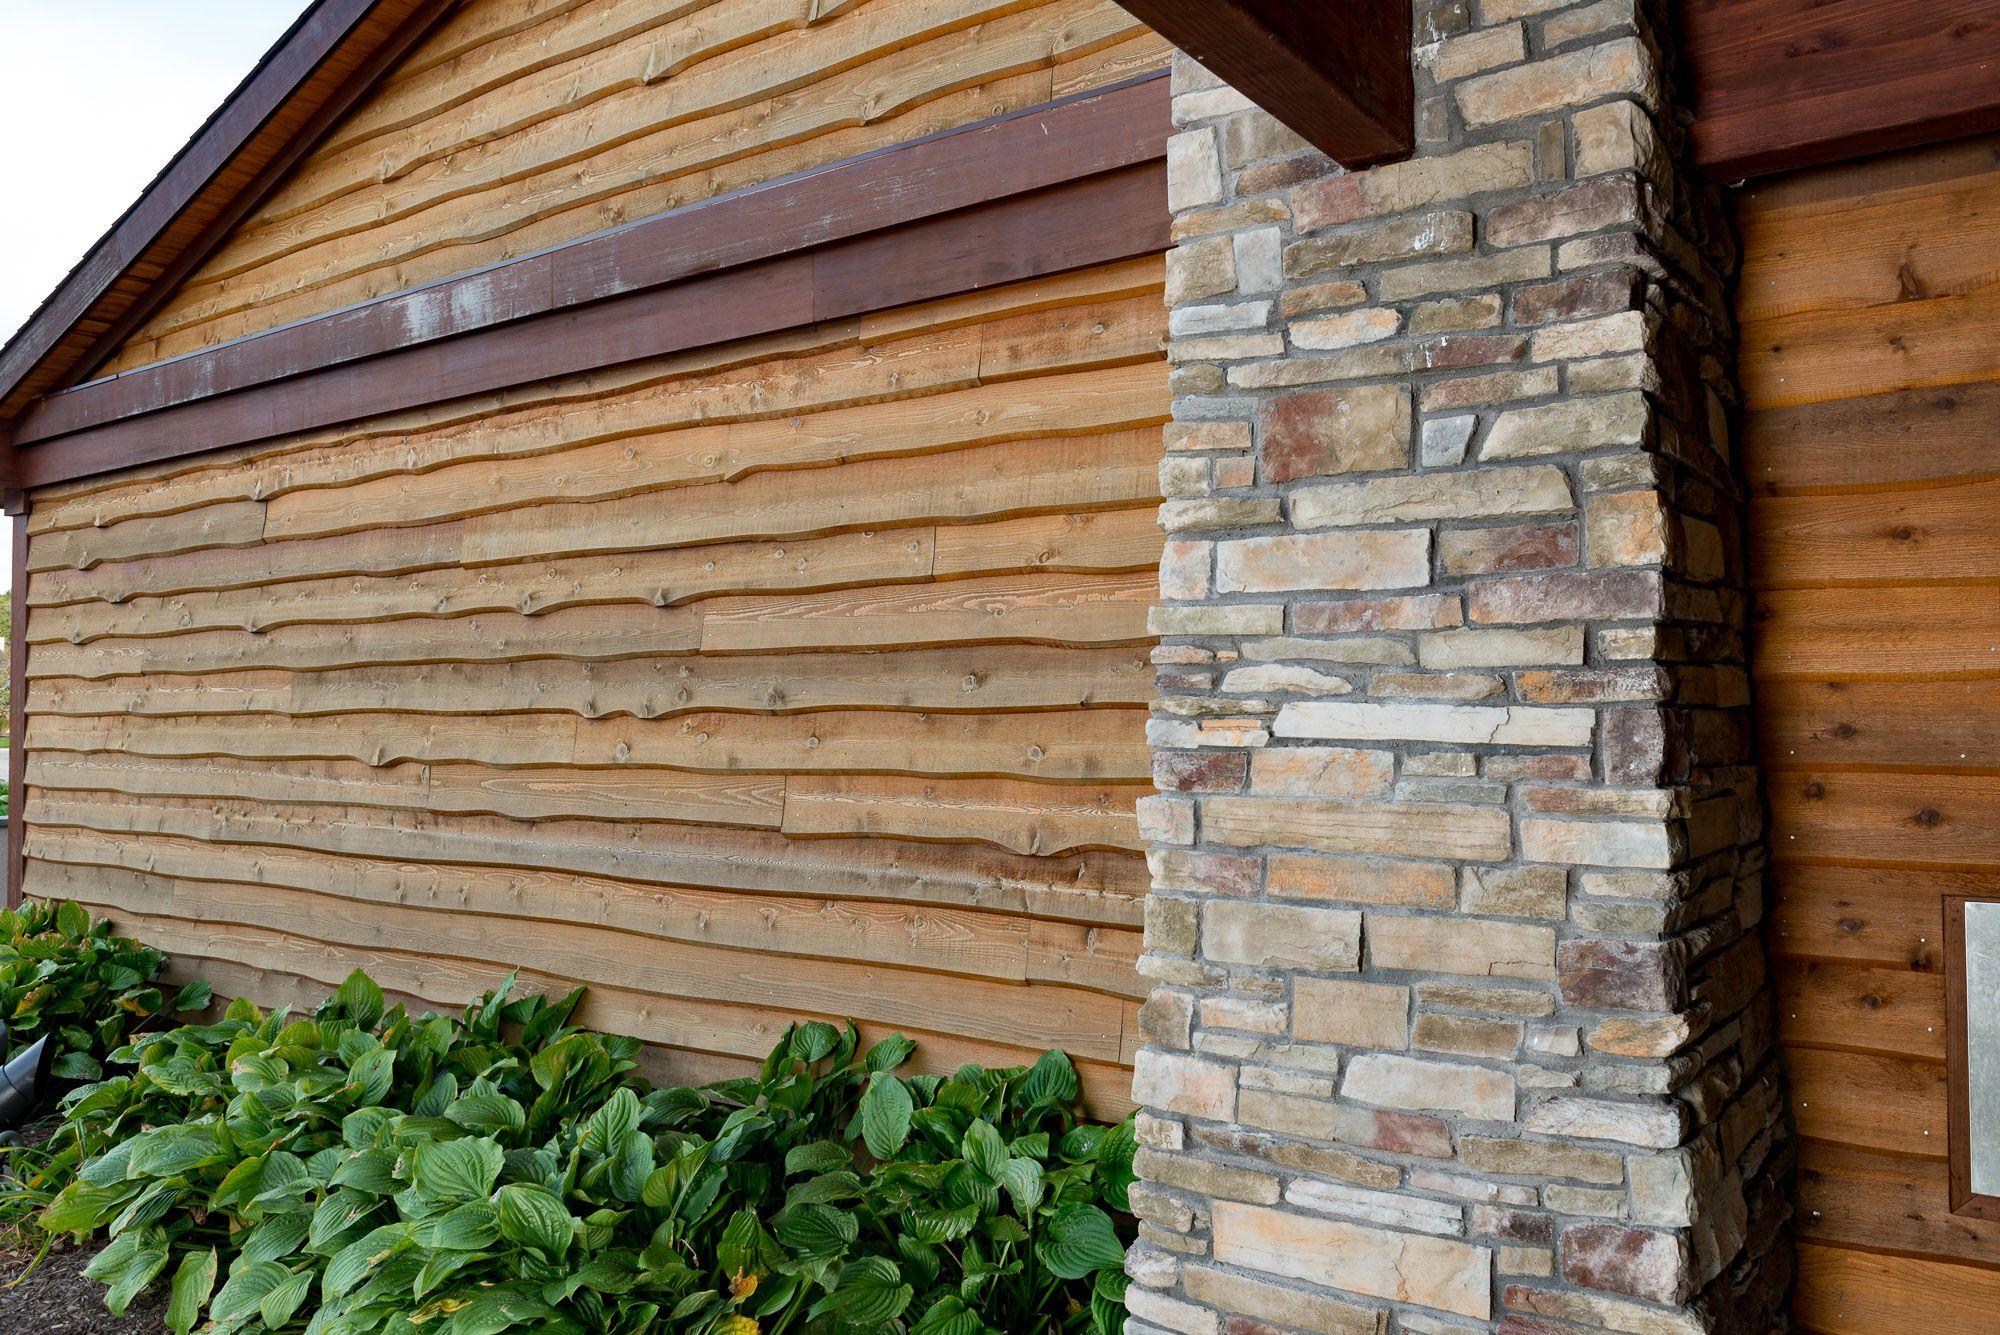 Park Center Wrapped In Our Wavy Edge Bevel Cedar Siding In 2020 Patio Art Cedar Siding Cedar Lumber